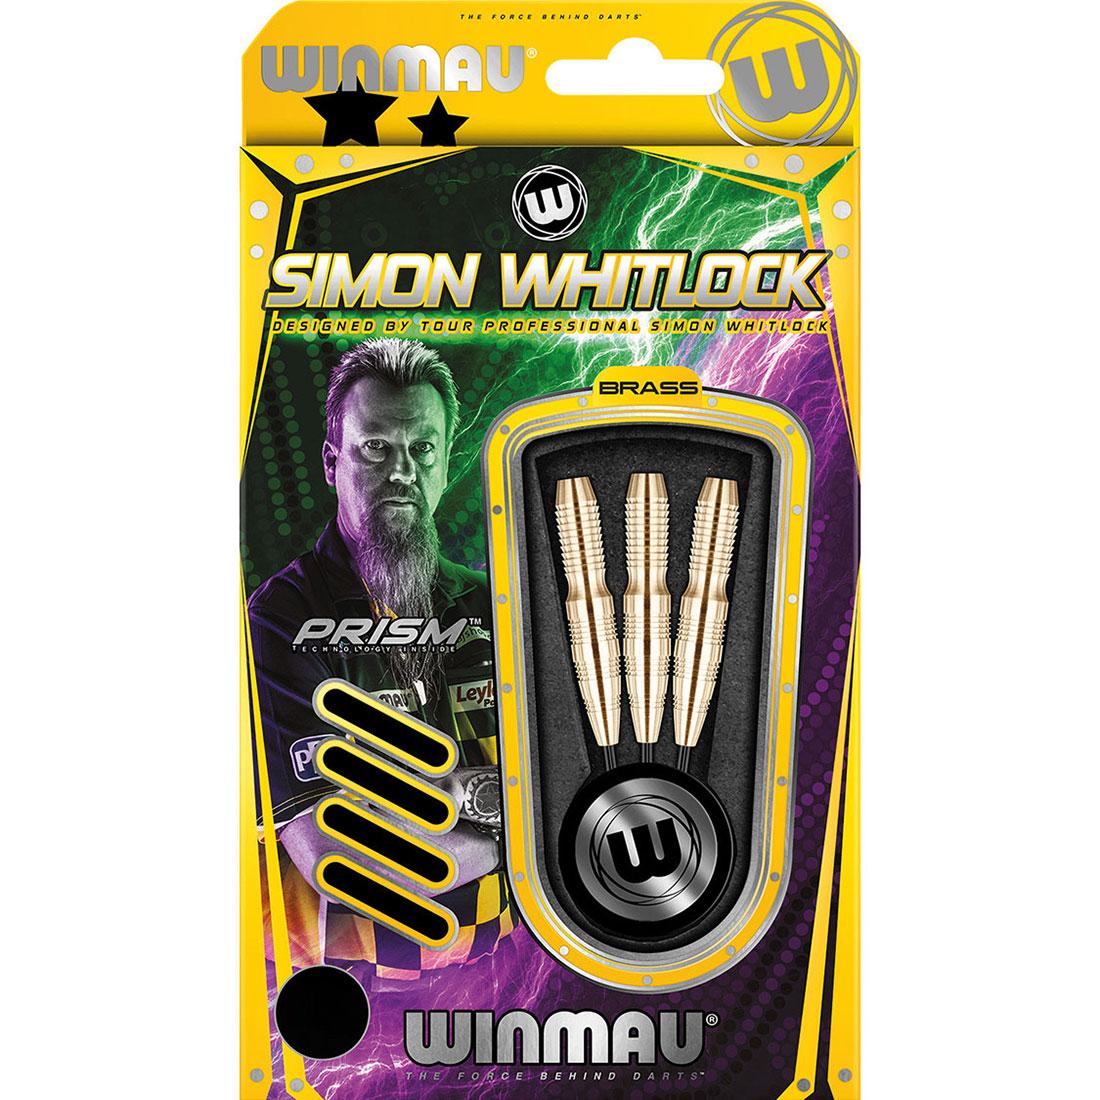 DA0181: Winmau Simon Whitlock #1